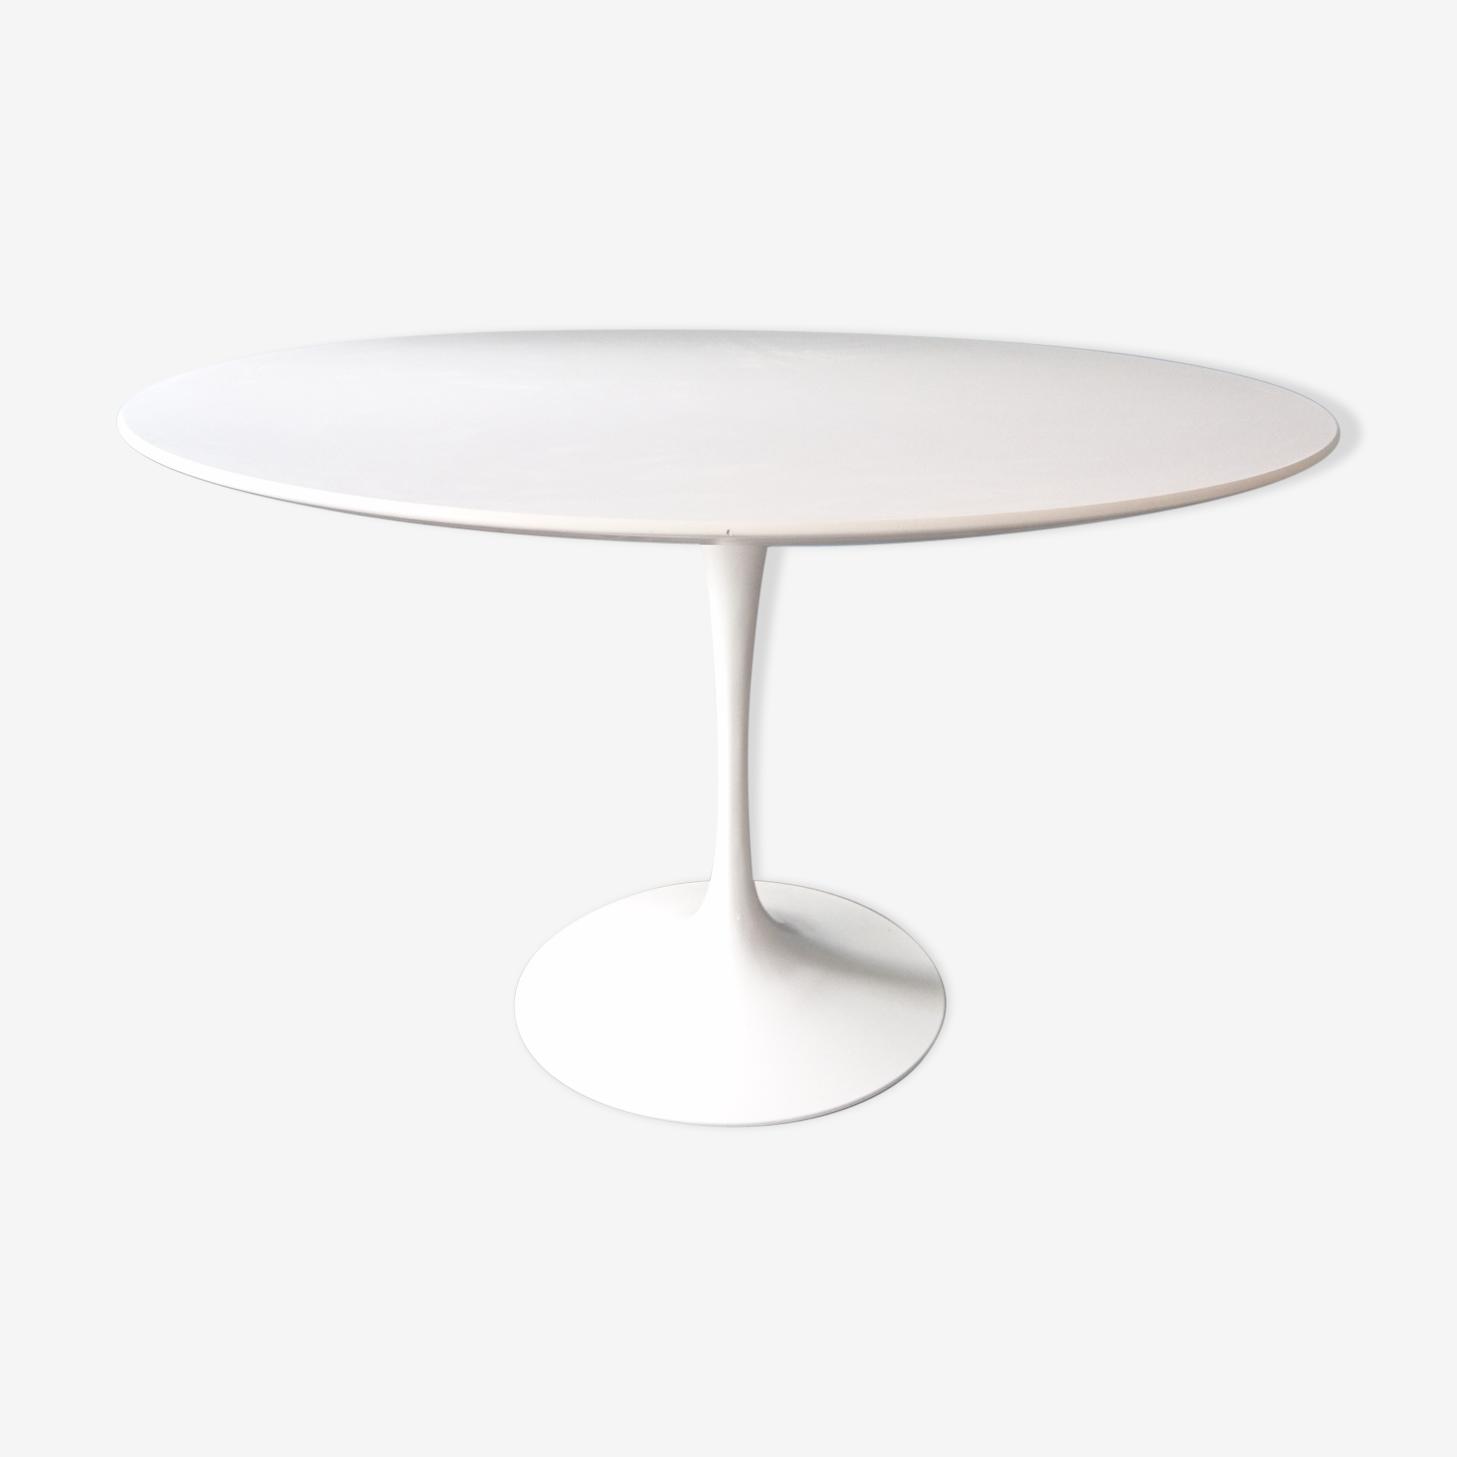 "Table ronde ""tulipe"" par Eero Saarinen pour Knoll"